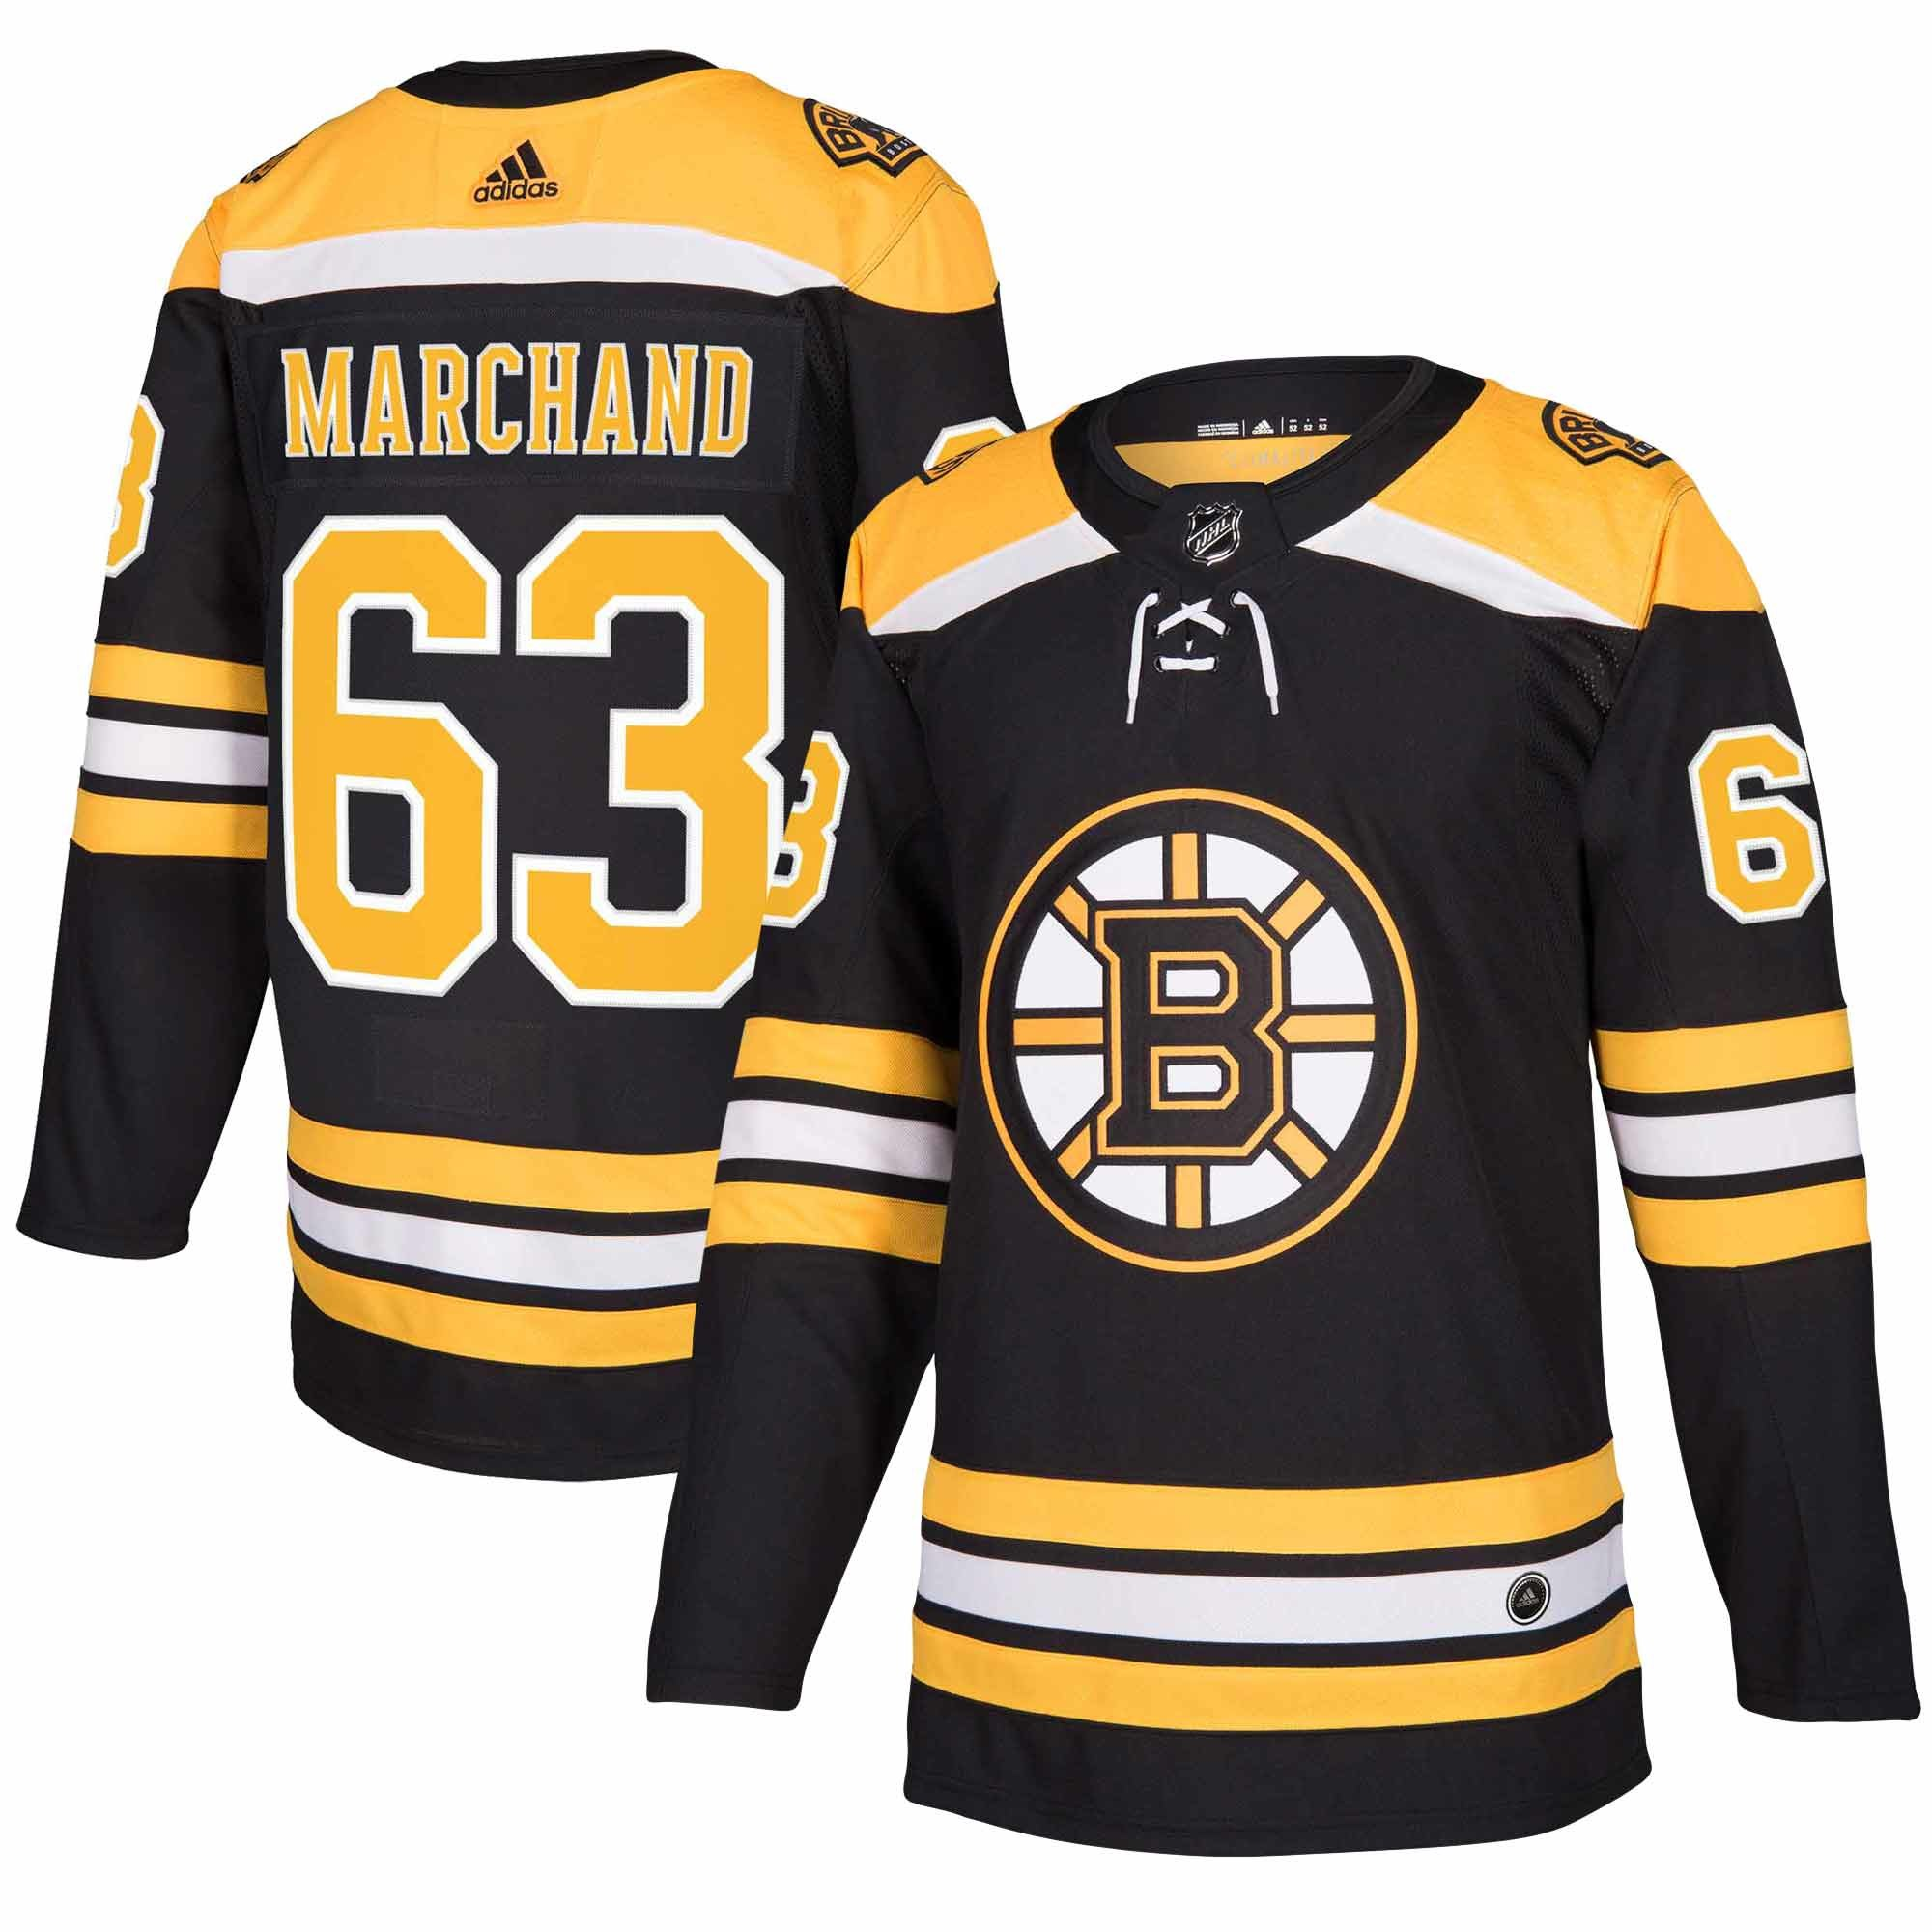 Adidas Dres Boston Bruins #63 Brad Marchand adizero Home Authentic Player Pro Velikost: L, Distribuce: USA